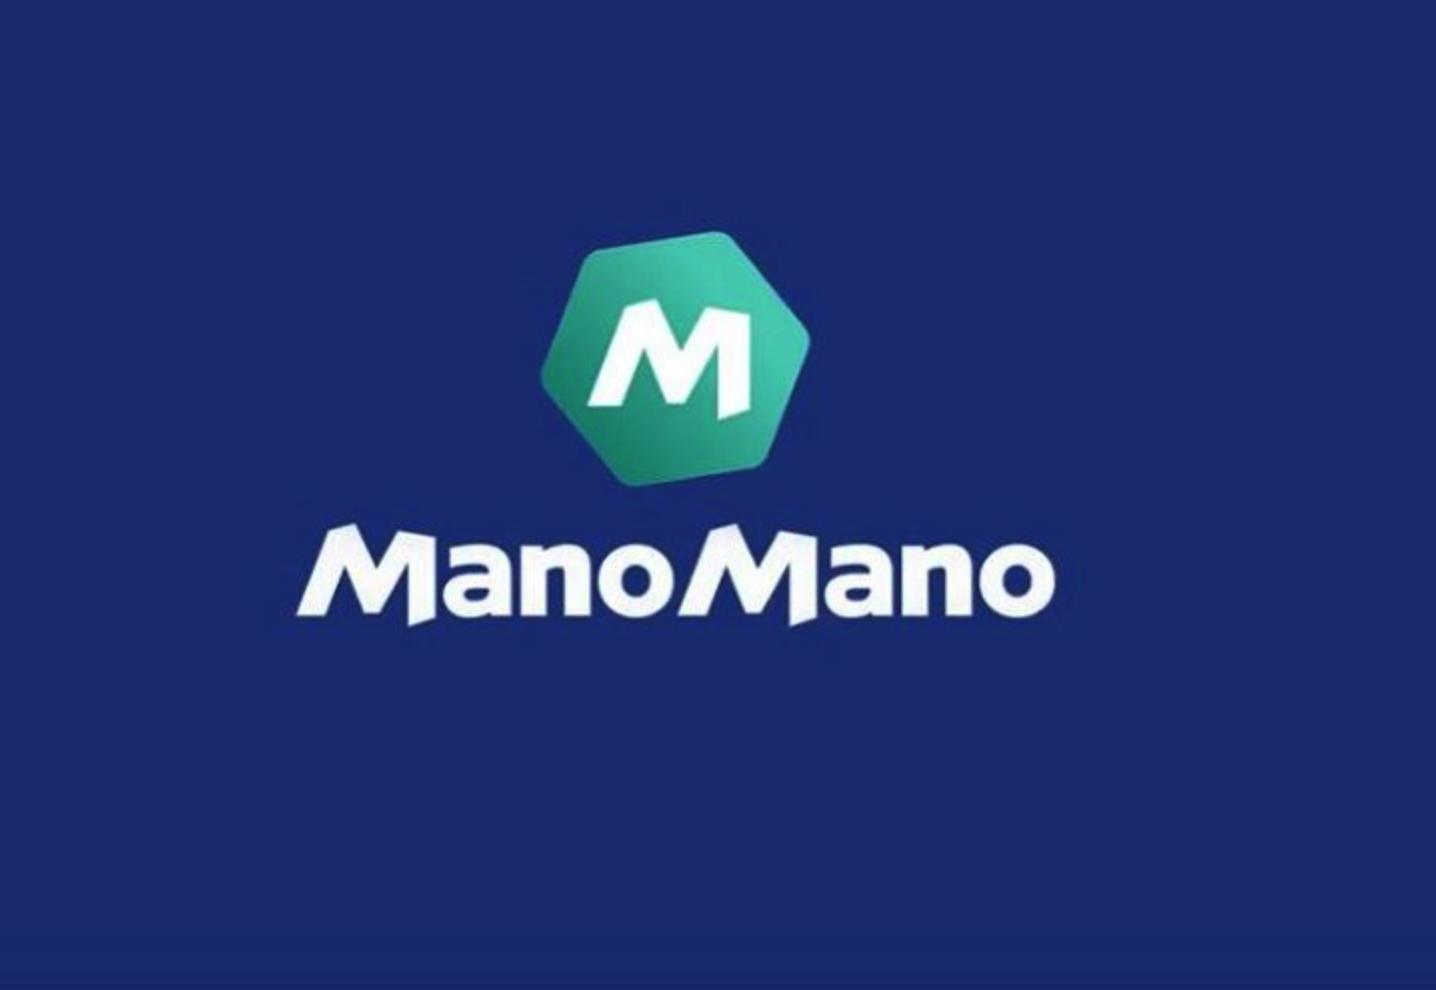 ManoMano's latest round of fundraising achieves €125m